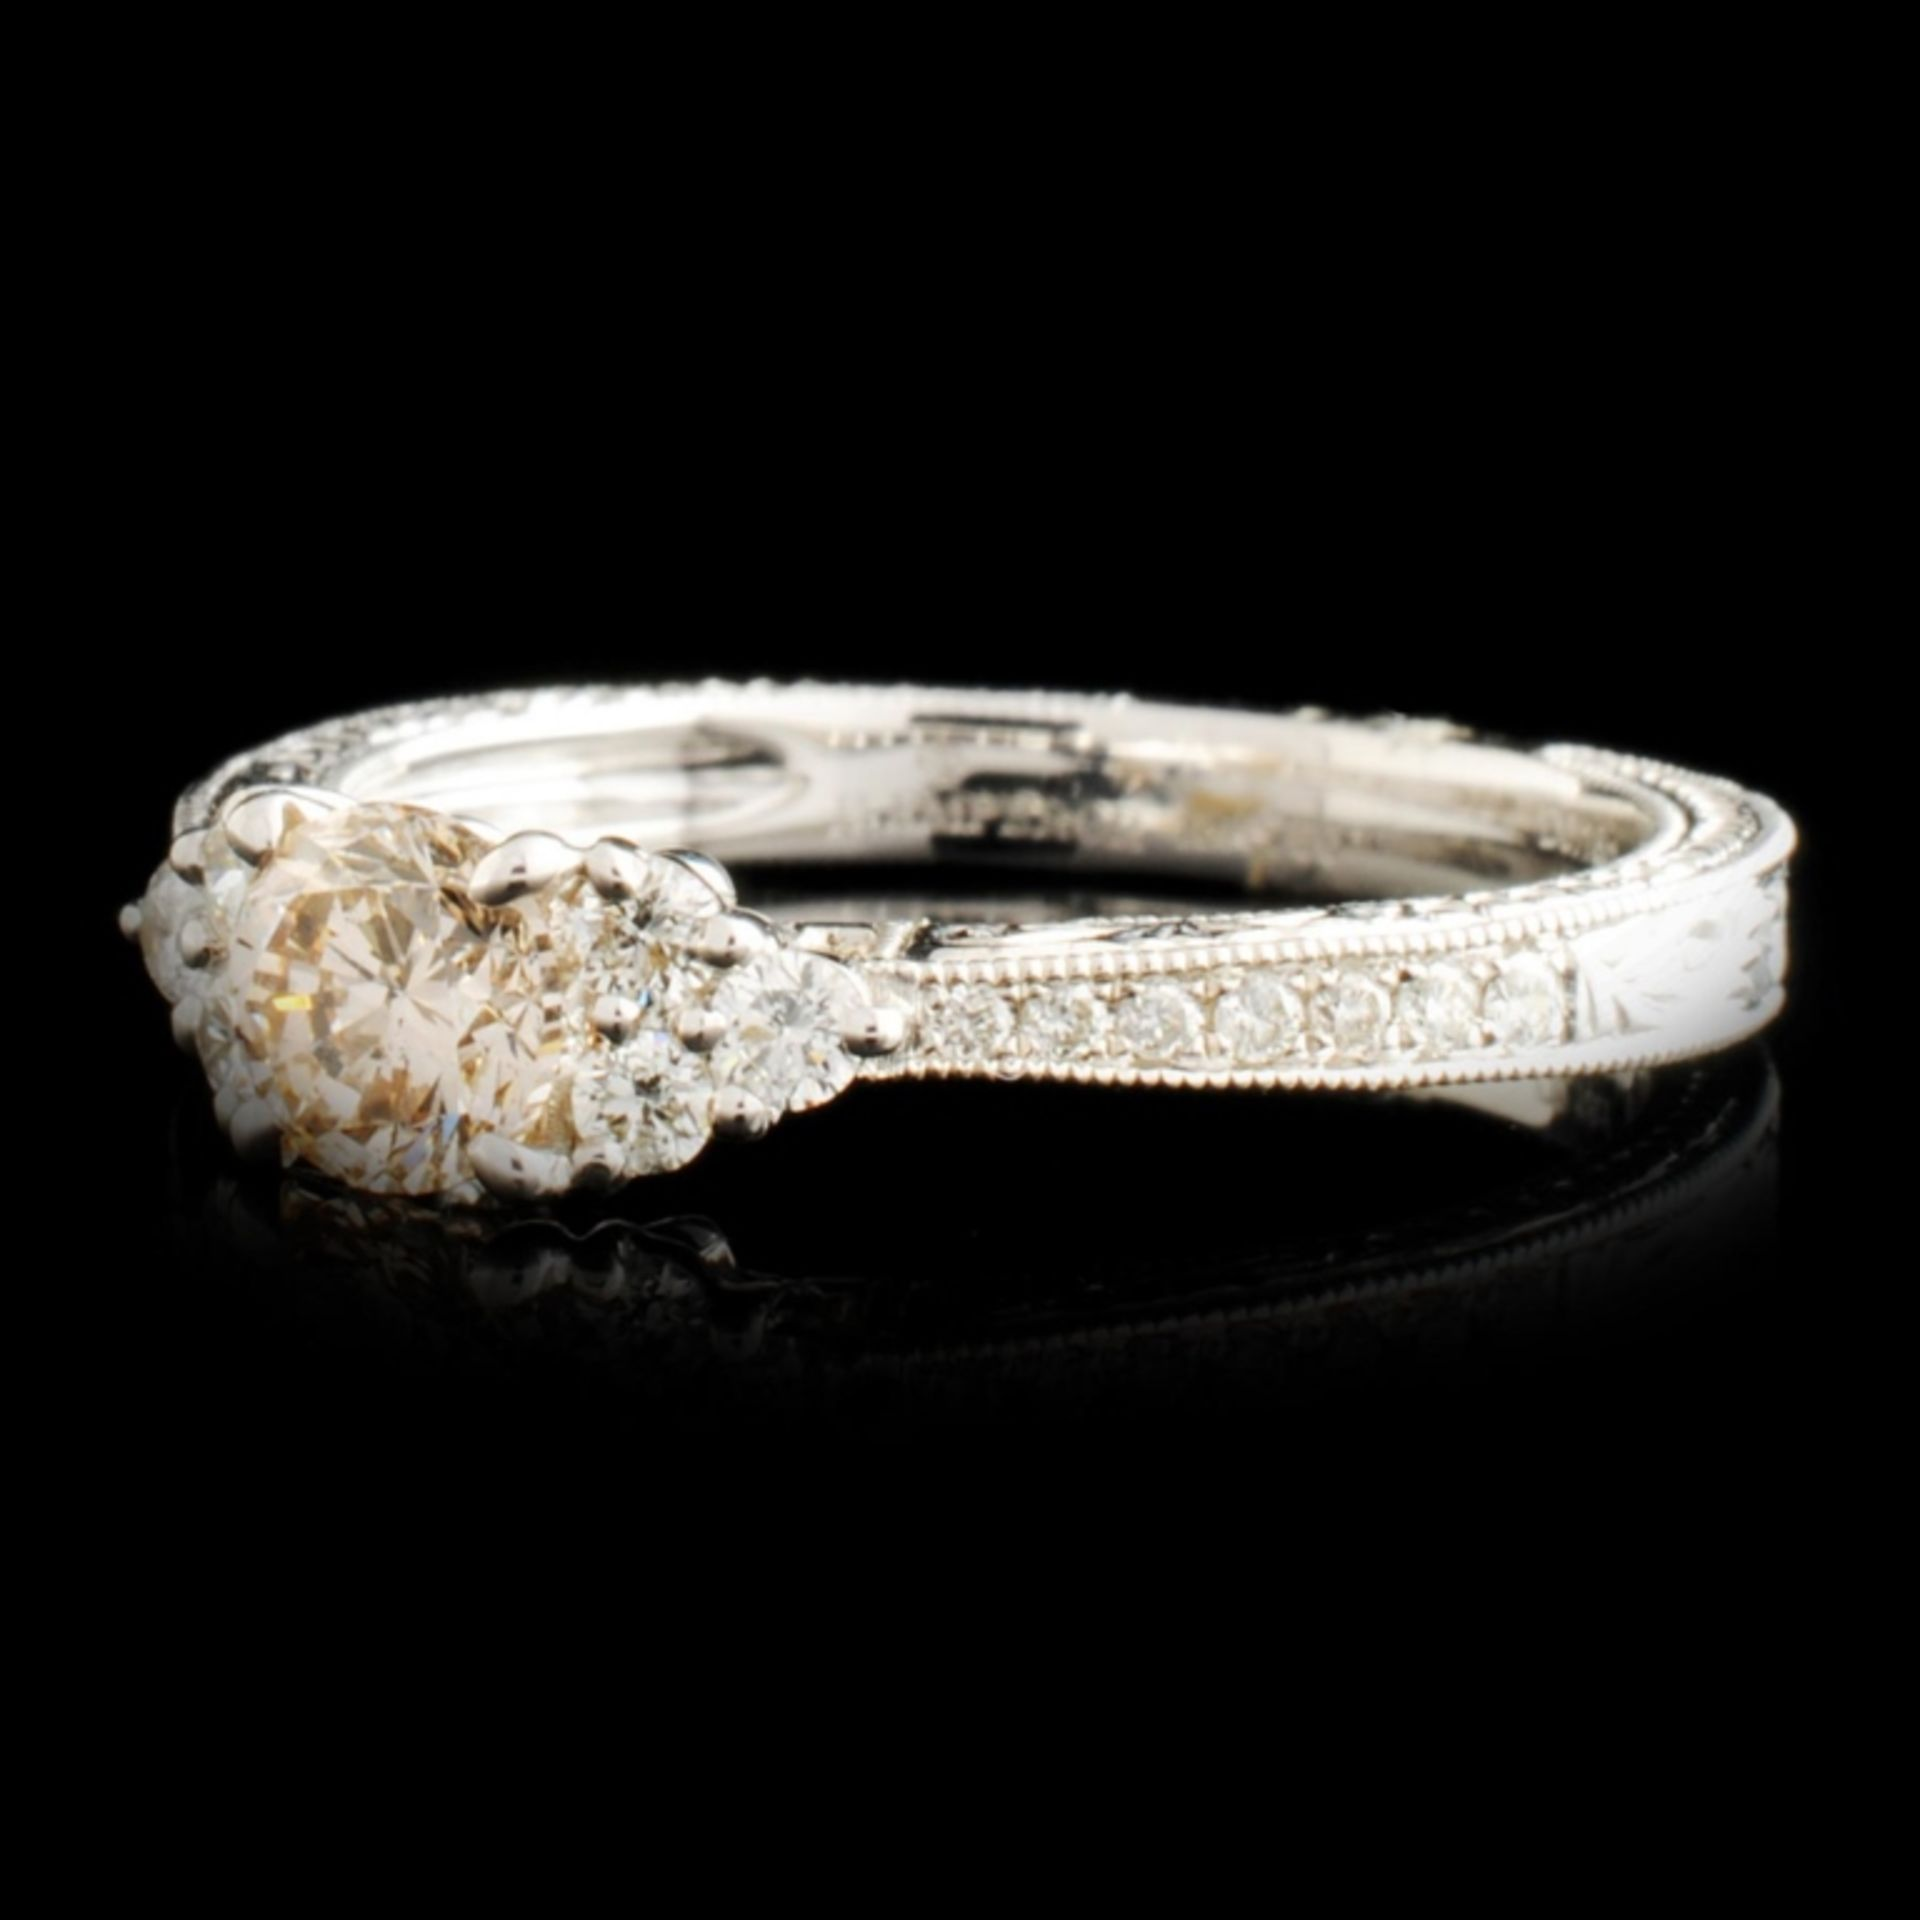 18K Gold 0.75ctw Diamond Ring - Image 2 of 5